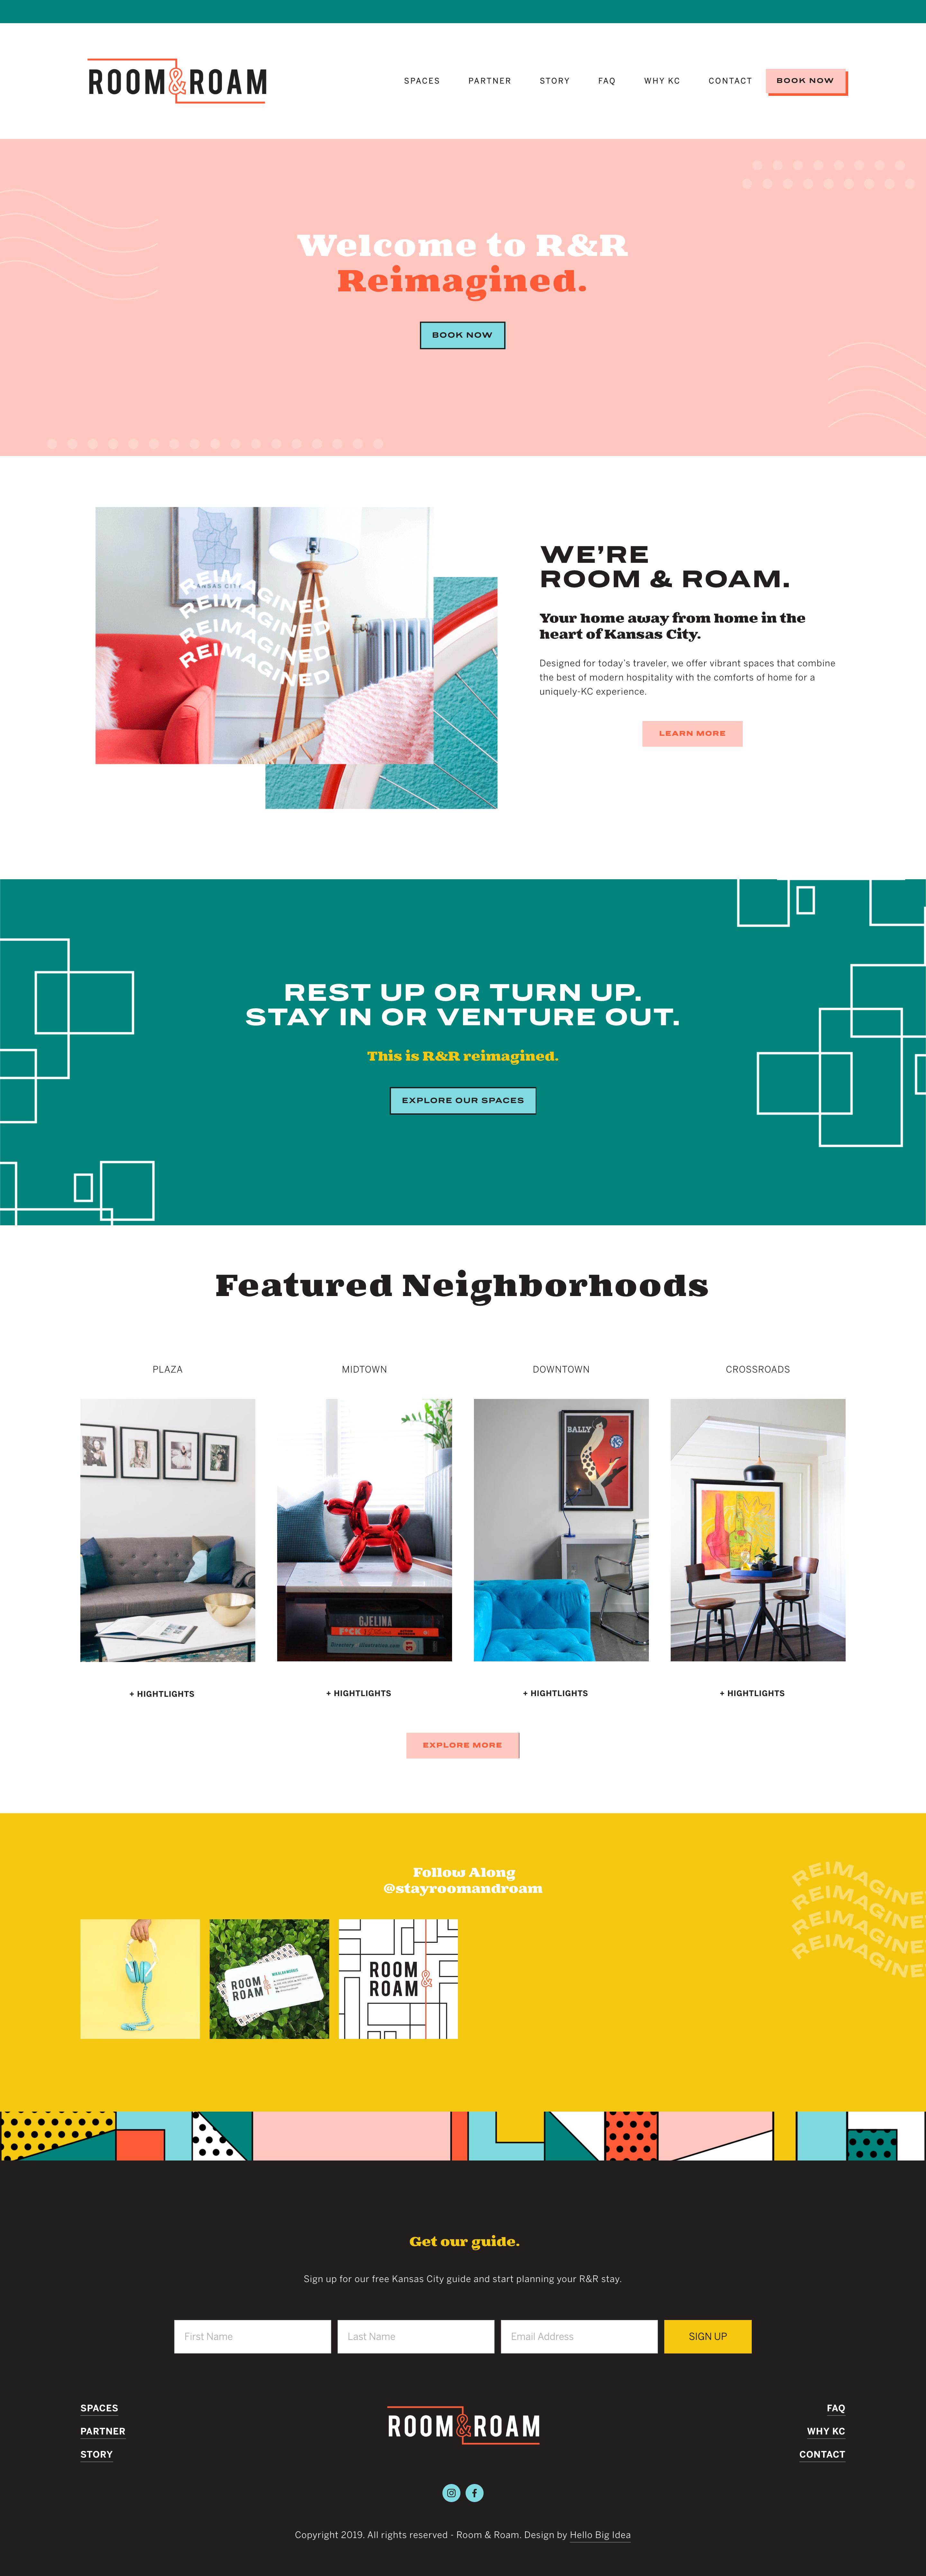 Kansas Web Design Company Web Design Marketing Agency